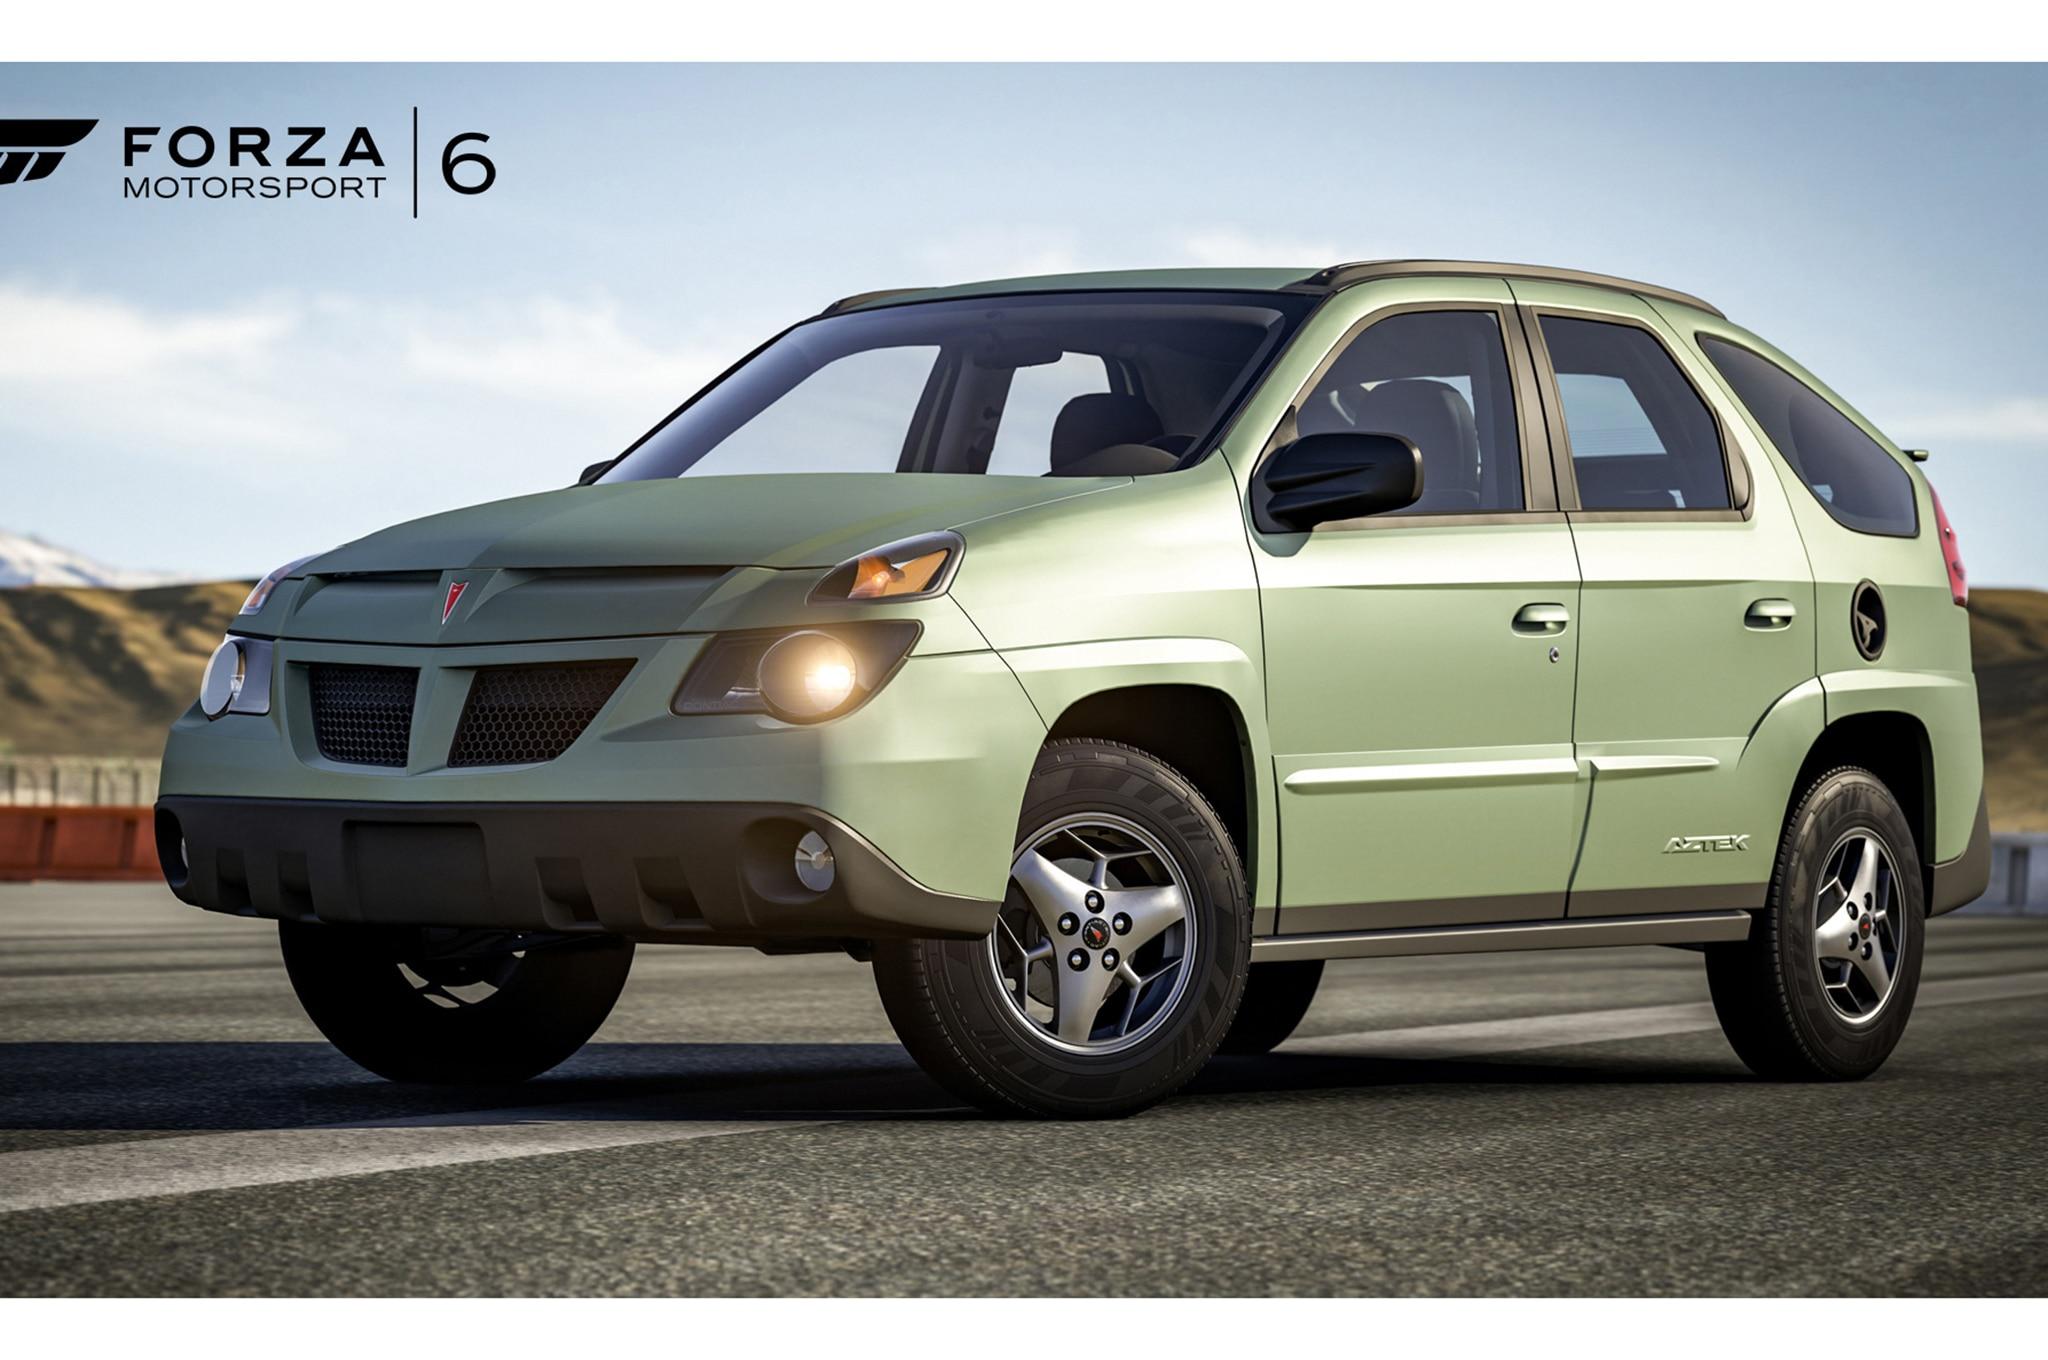 Latest Forza Motorsport 6 Car Pack Includes The Pontiac Aztek